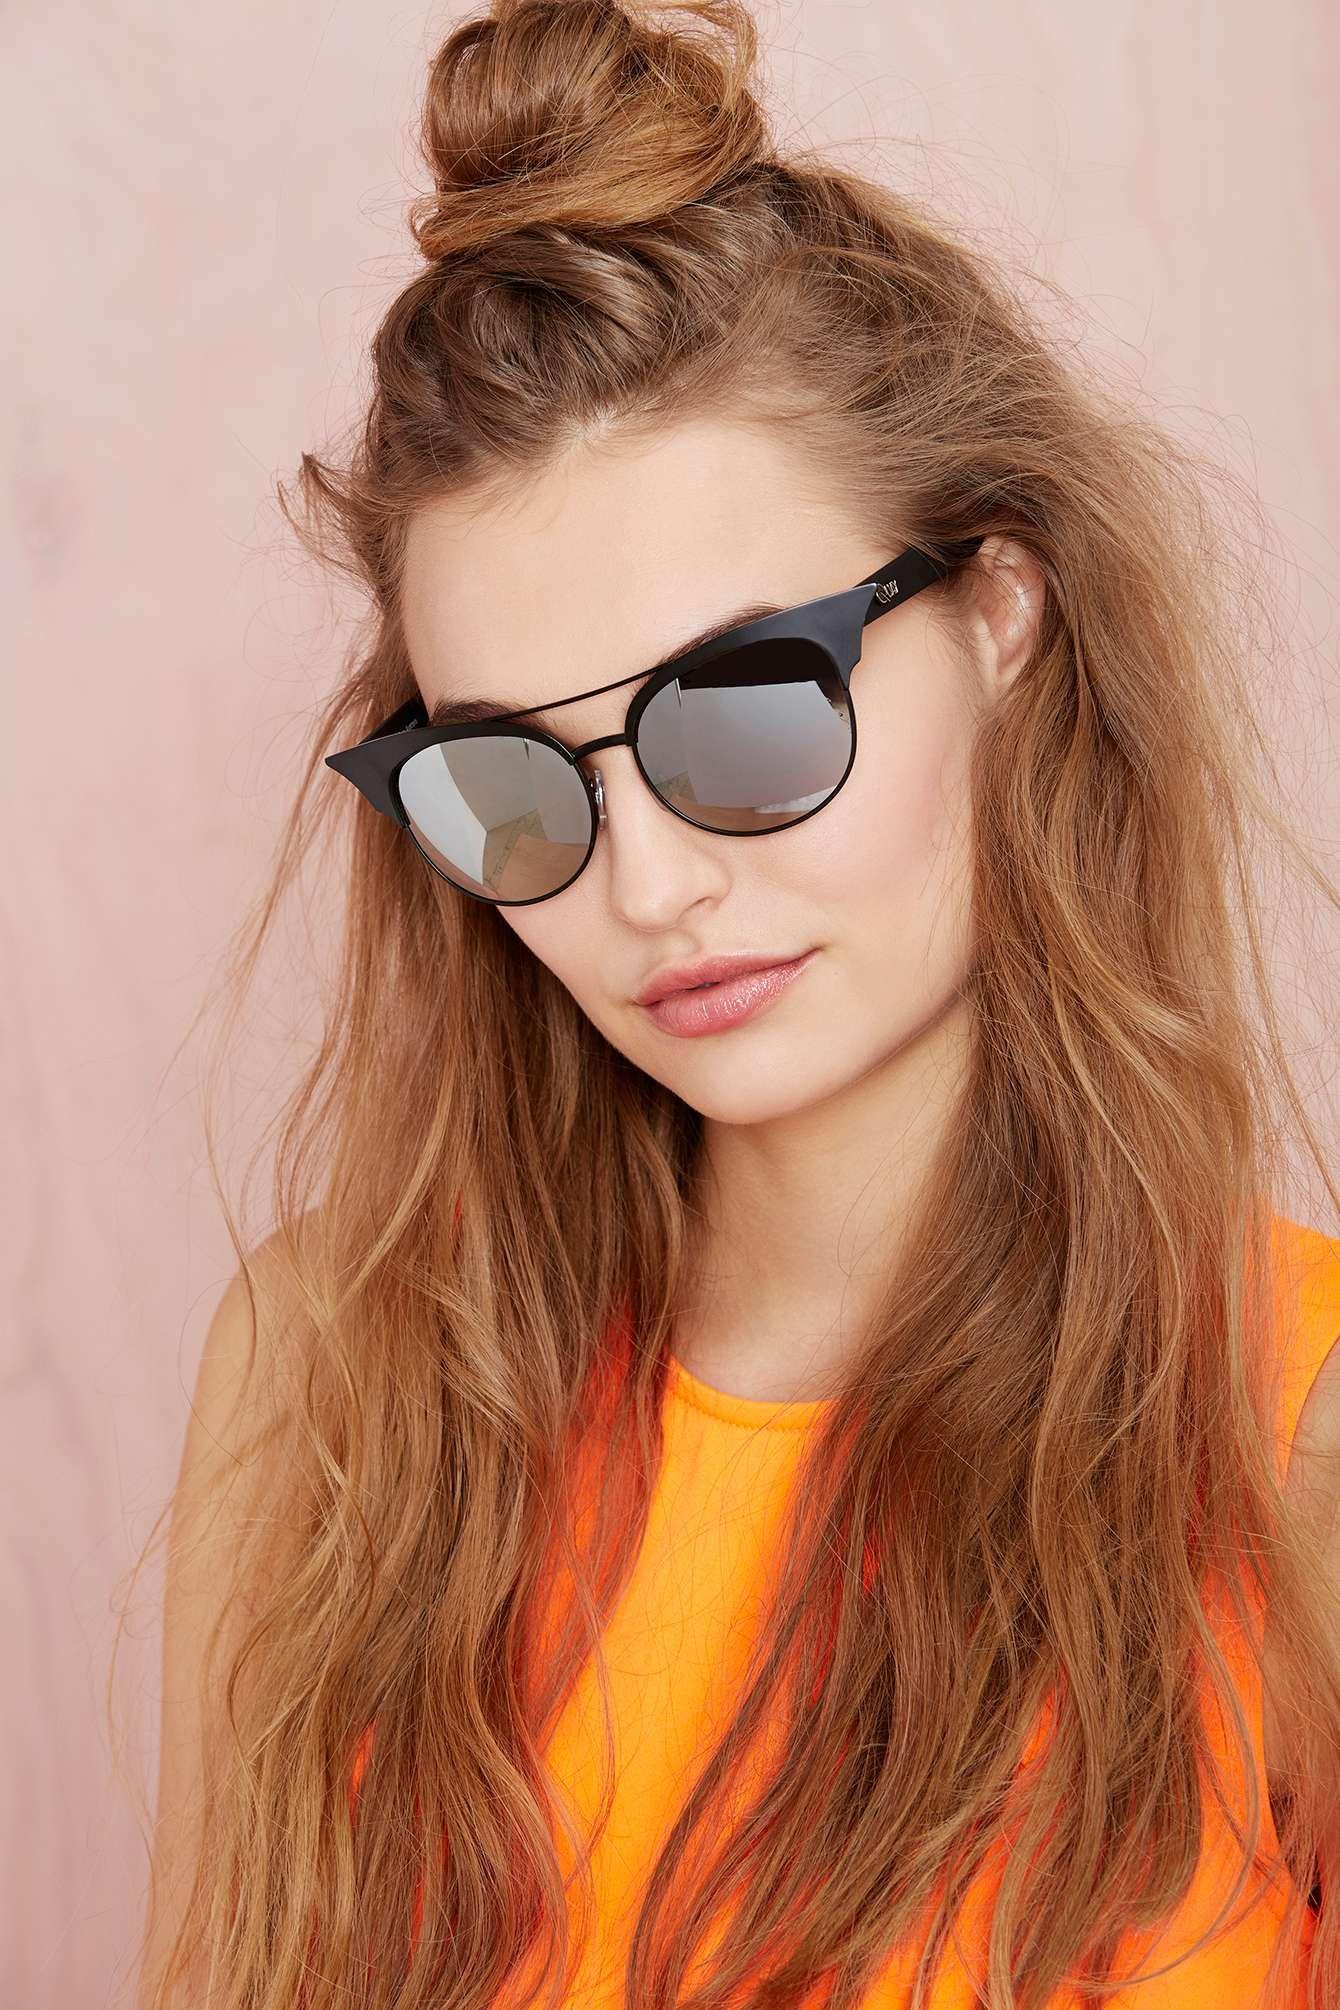 Round sunglasses u chic hair artbuyglasses